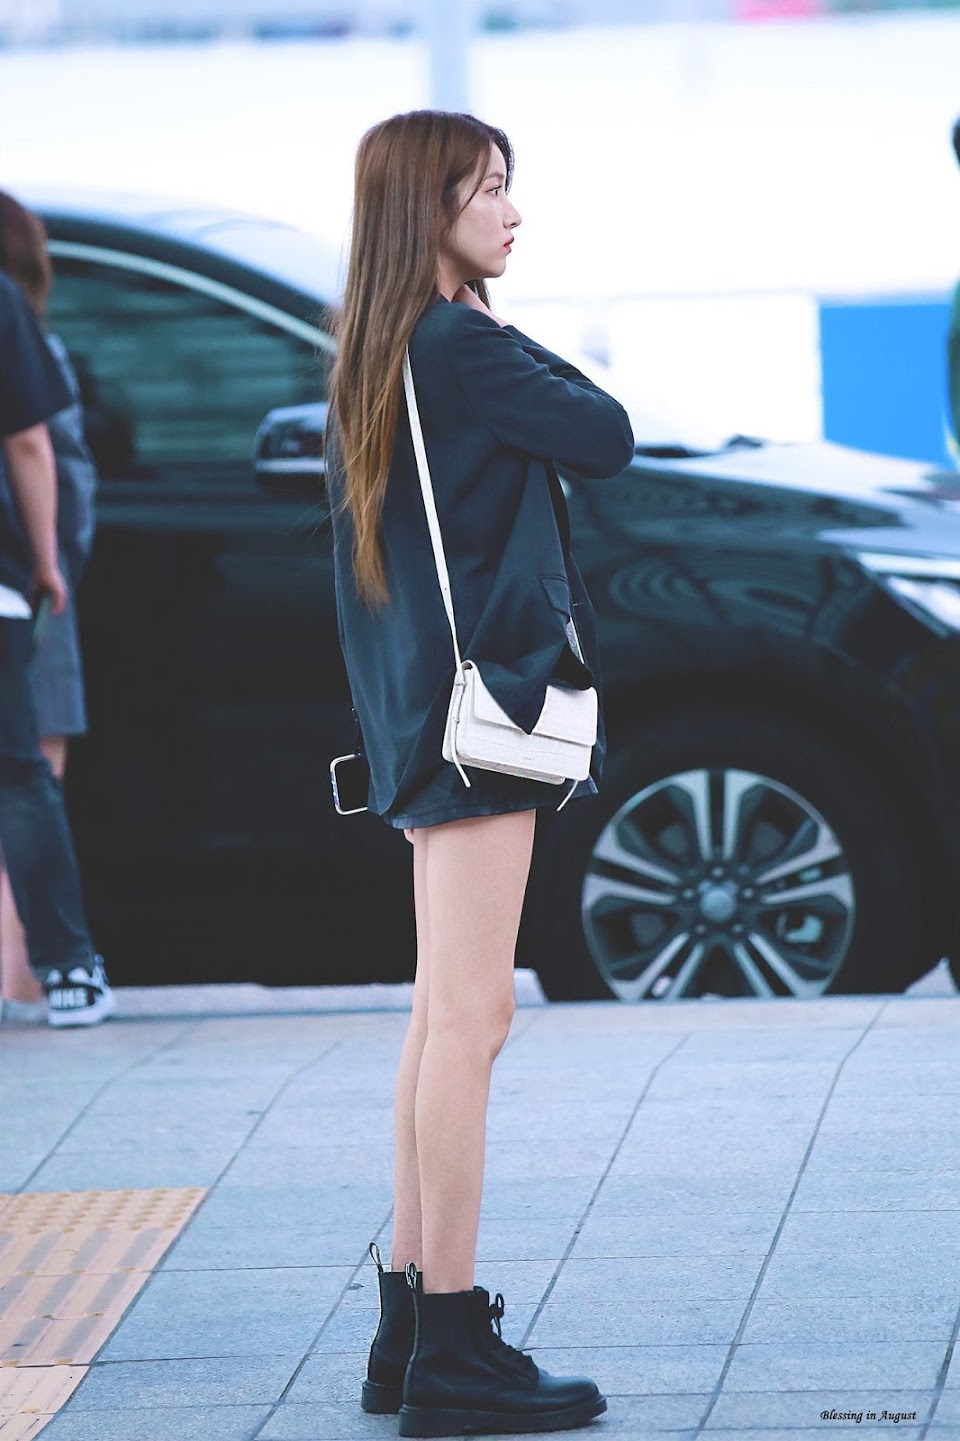 sowon body 27